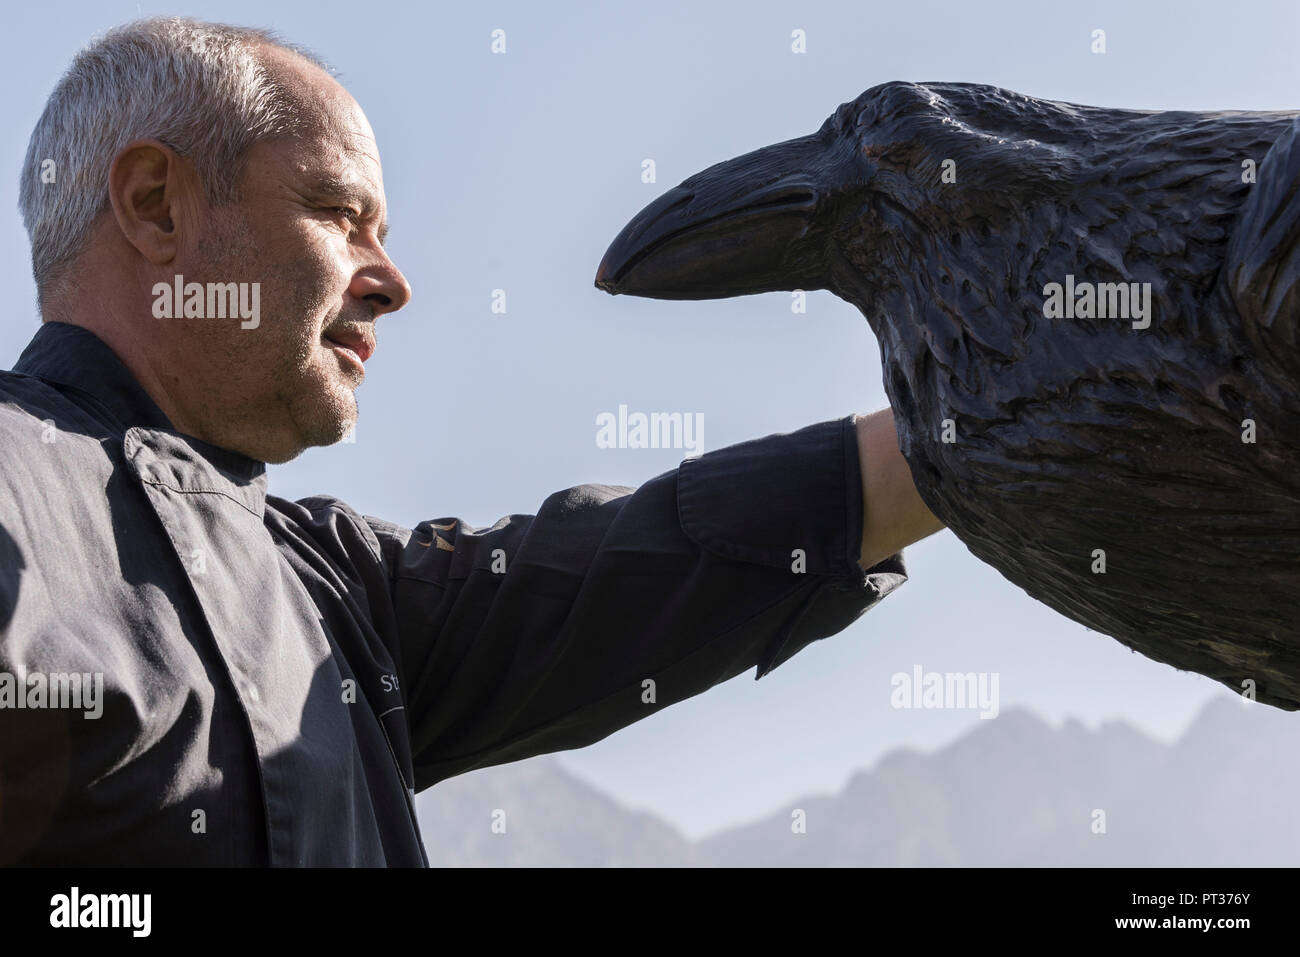 Stefan Pramstaller with raven figure, Romantik Hotel Turm, Fiè allo Sciliar, Alpe di Siusi, Eisacktal, South Tyrol, Italy - Stock Image